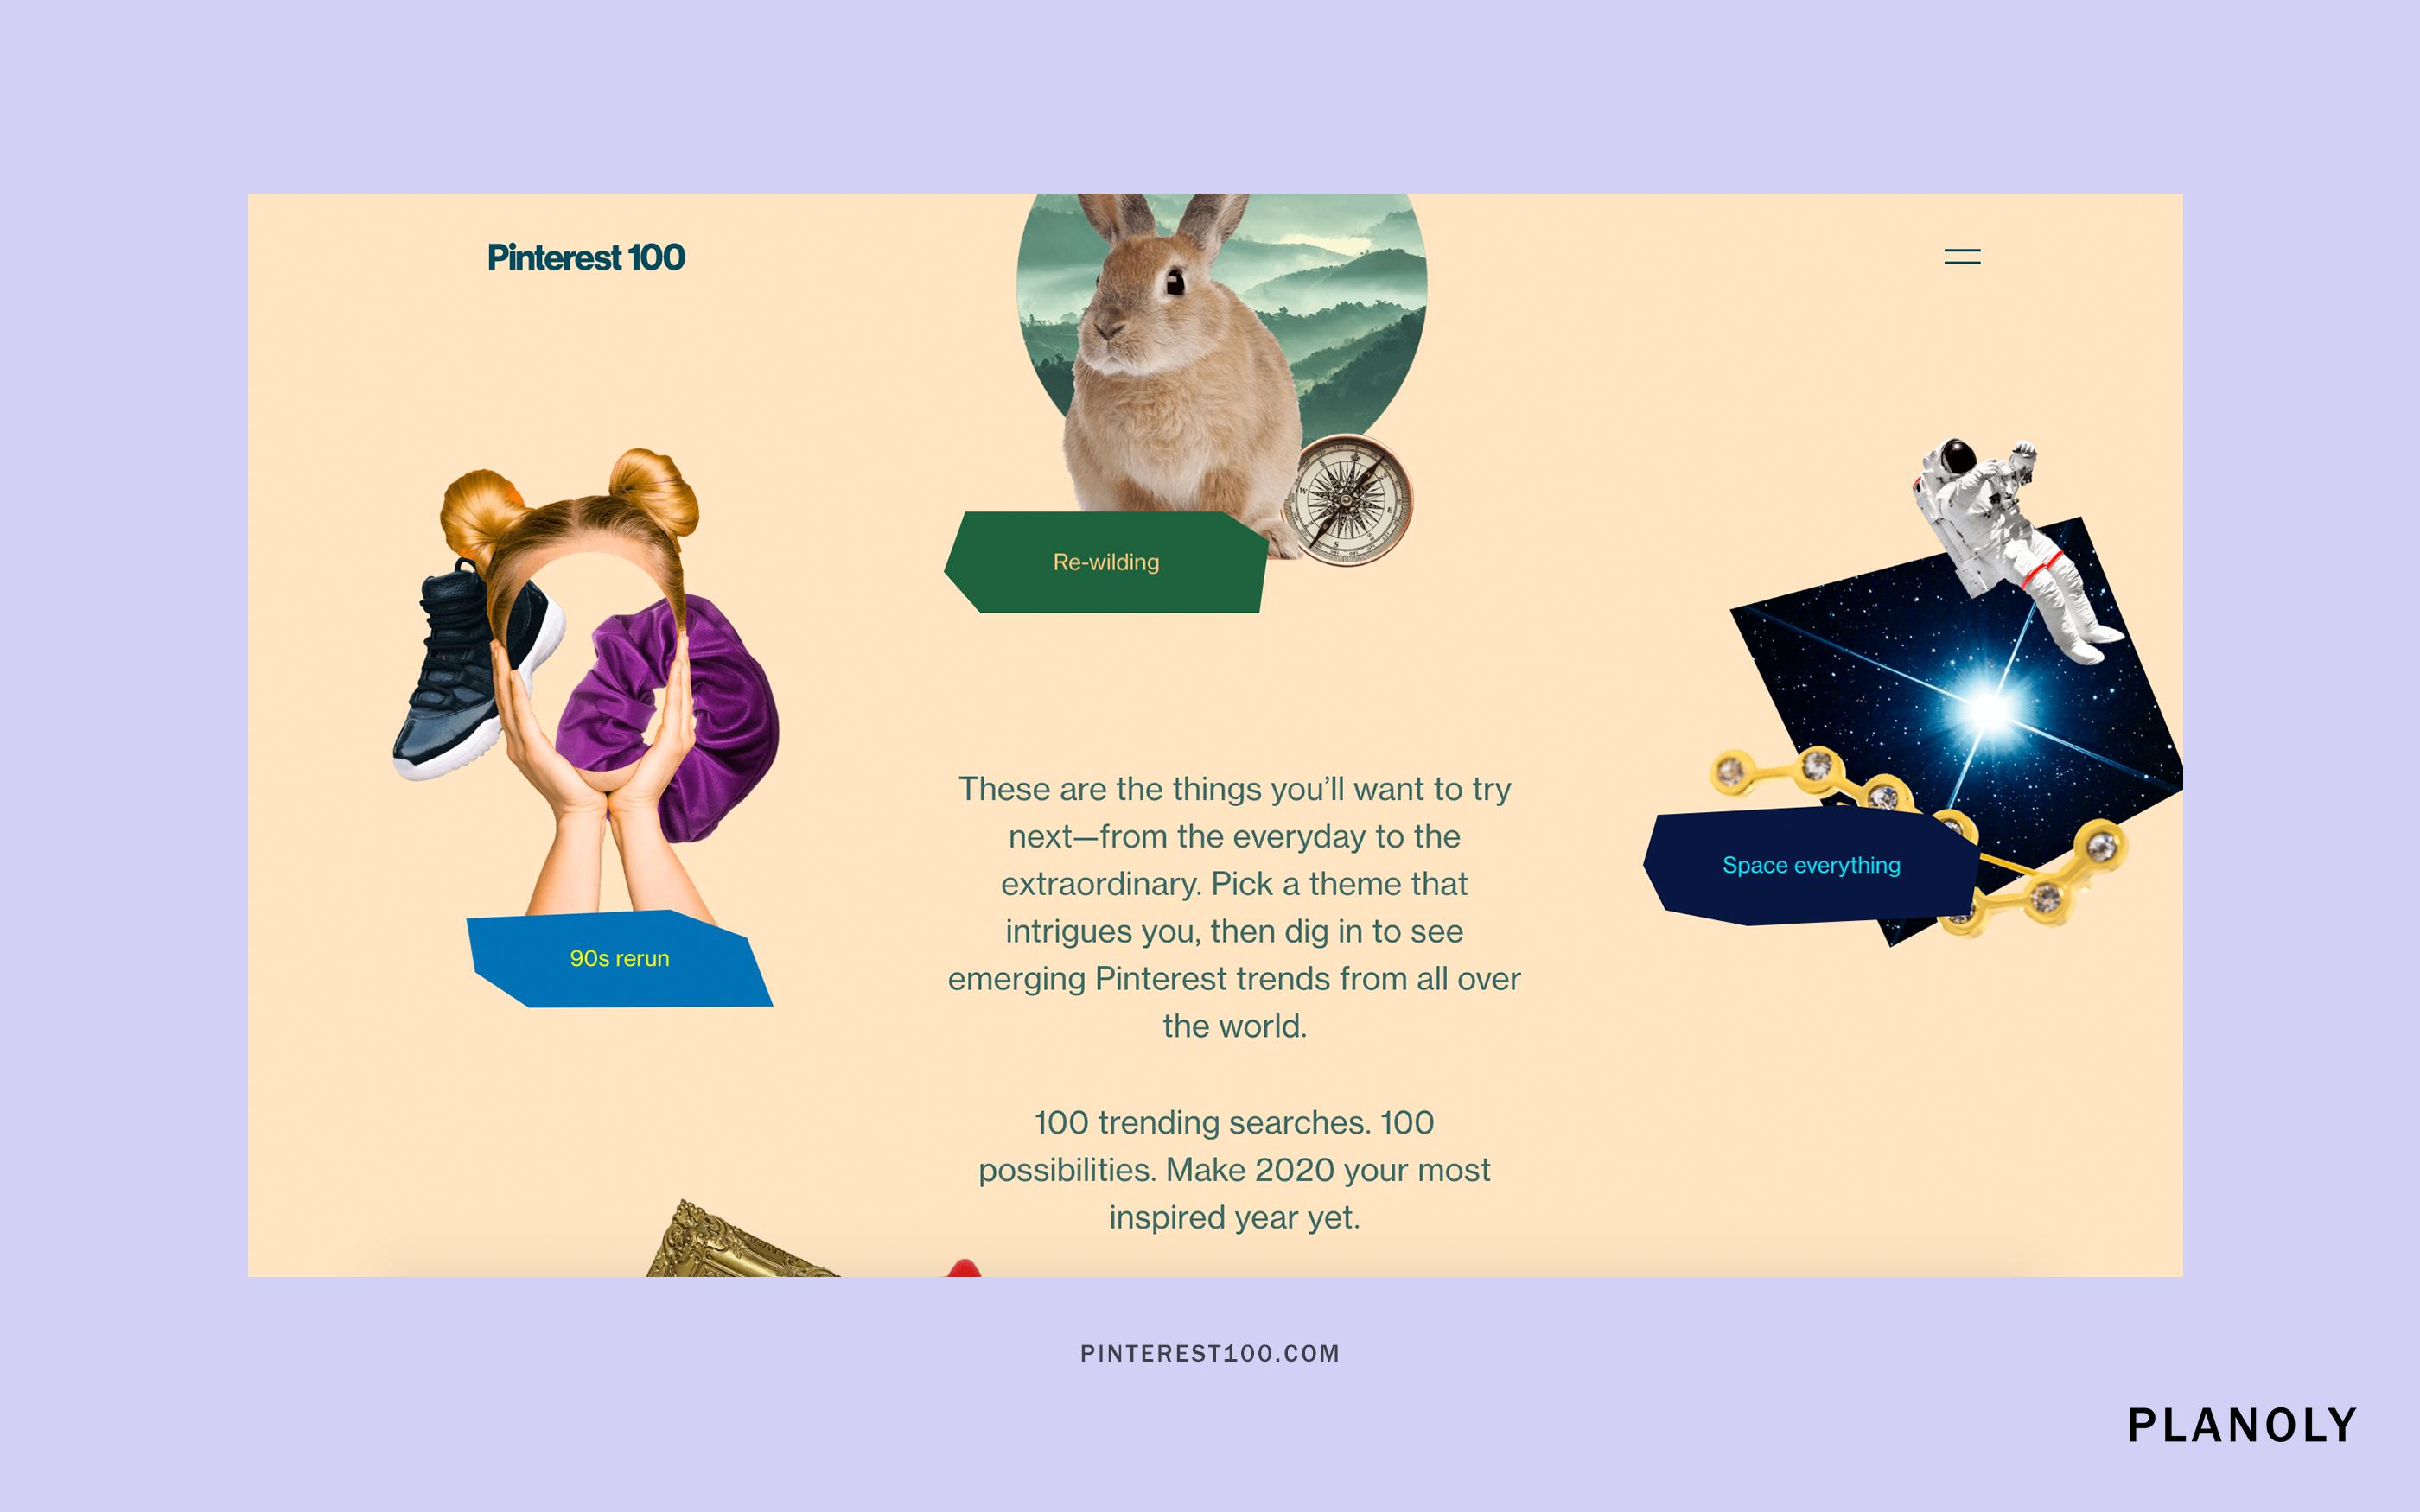 Pinterest Q1 2020 Trend Report